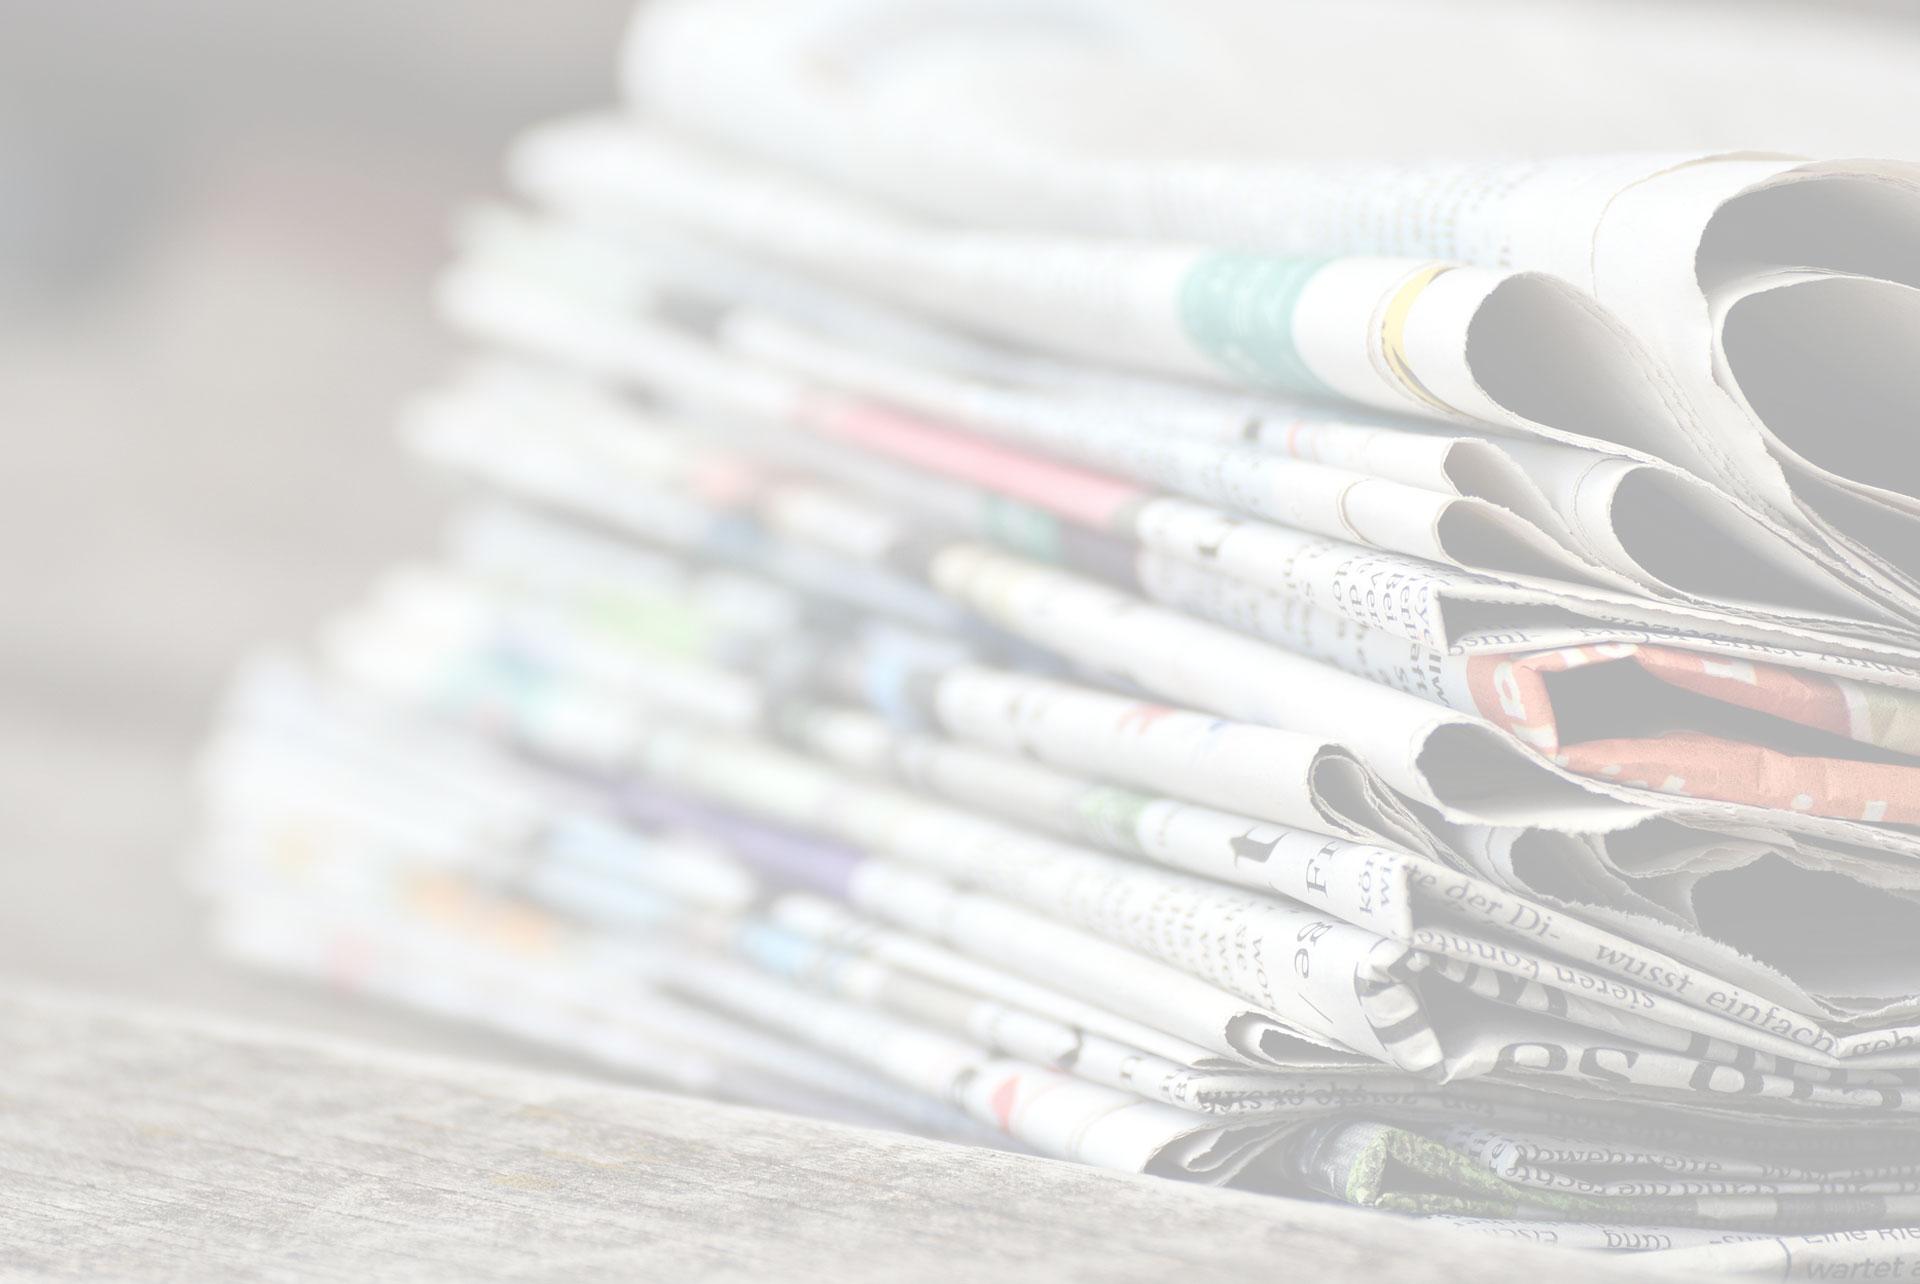 Sanremo, la nuova gaffe di Amadeus: